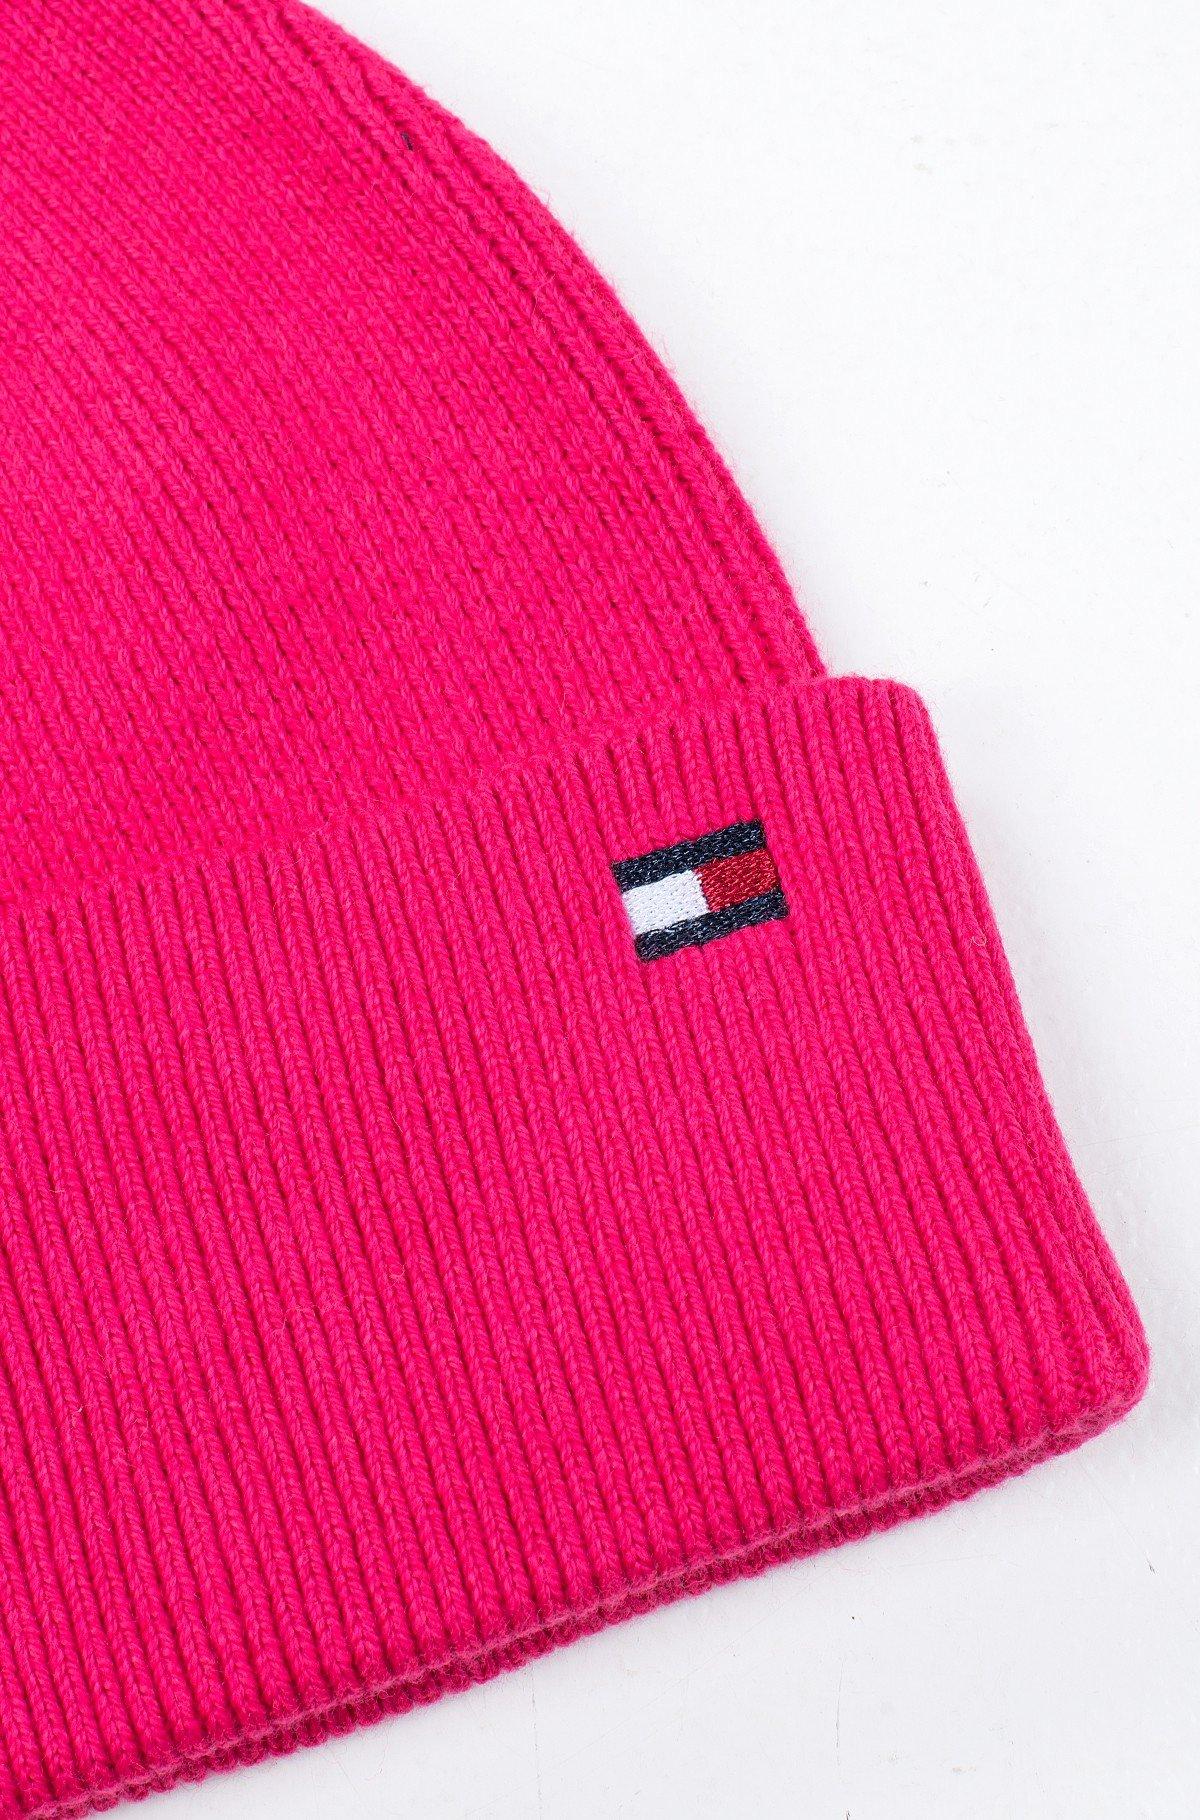 Cepure ESSENTIAL KNIT BEANIE-full-3